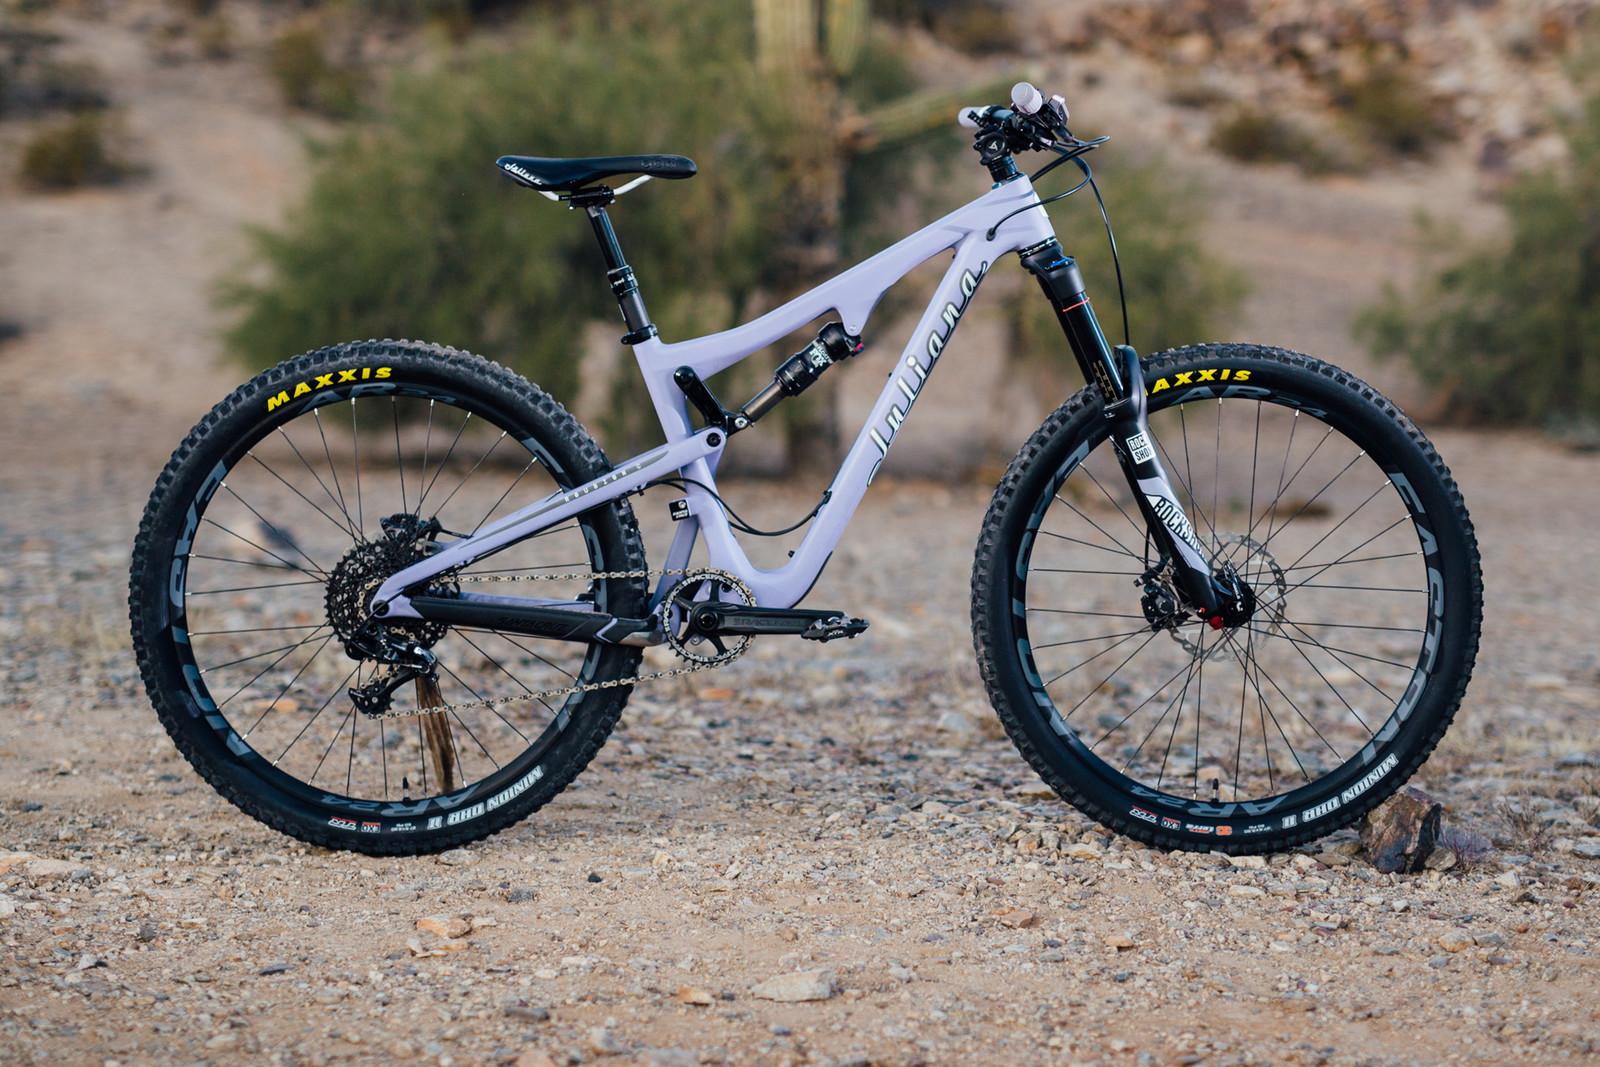 2016 Juliana Roubion C S - 17 Bikes Tested - 2016 Vital MTB Test Sessions - Mountain Biking Pictures - Vital MTB